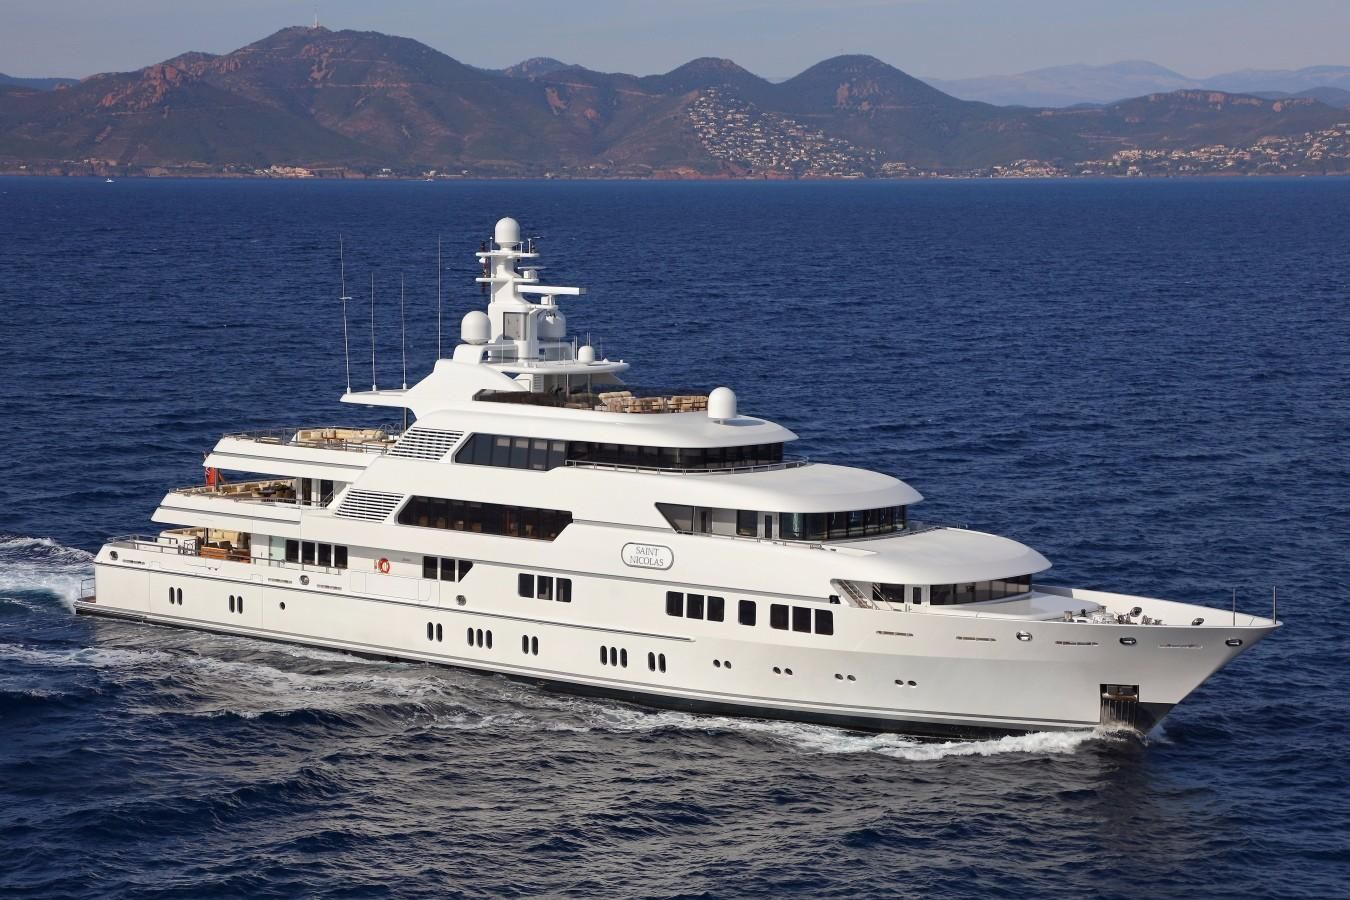 2007 lurssen full displacement power boat for sale www for Lurssen yacht genova